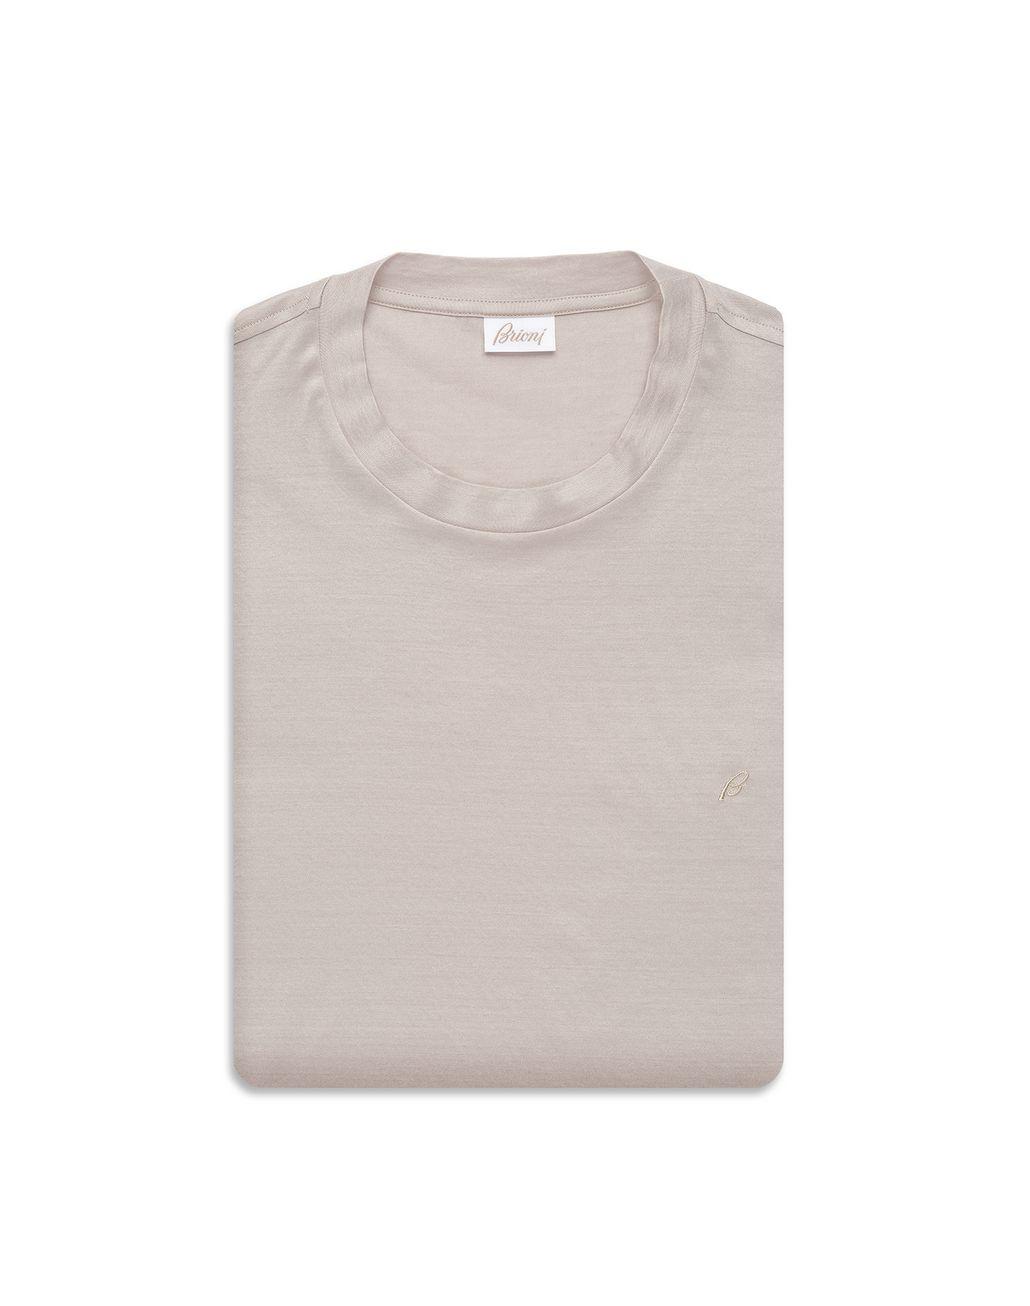 BRIONI Beige Logoed T-Shirt T-Shirts & Polos Man e